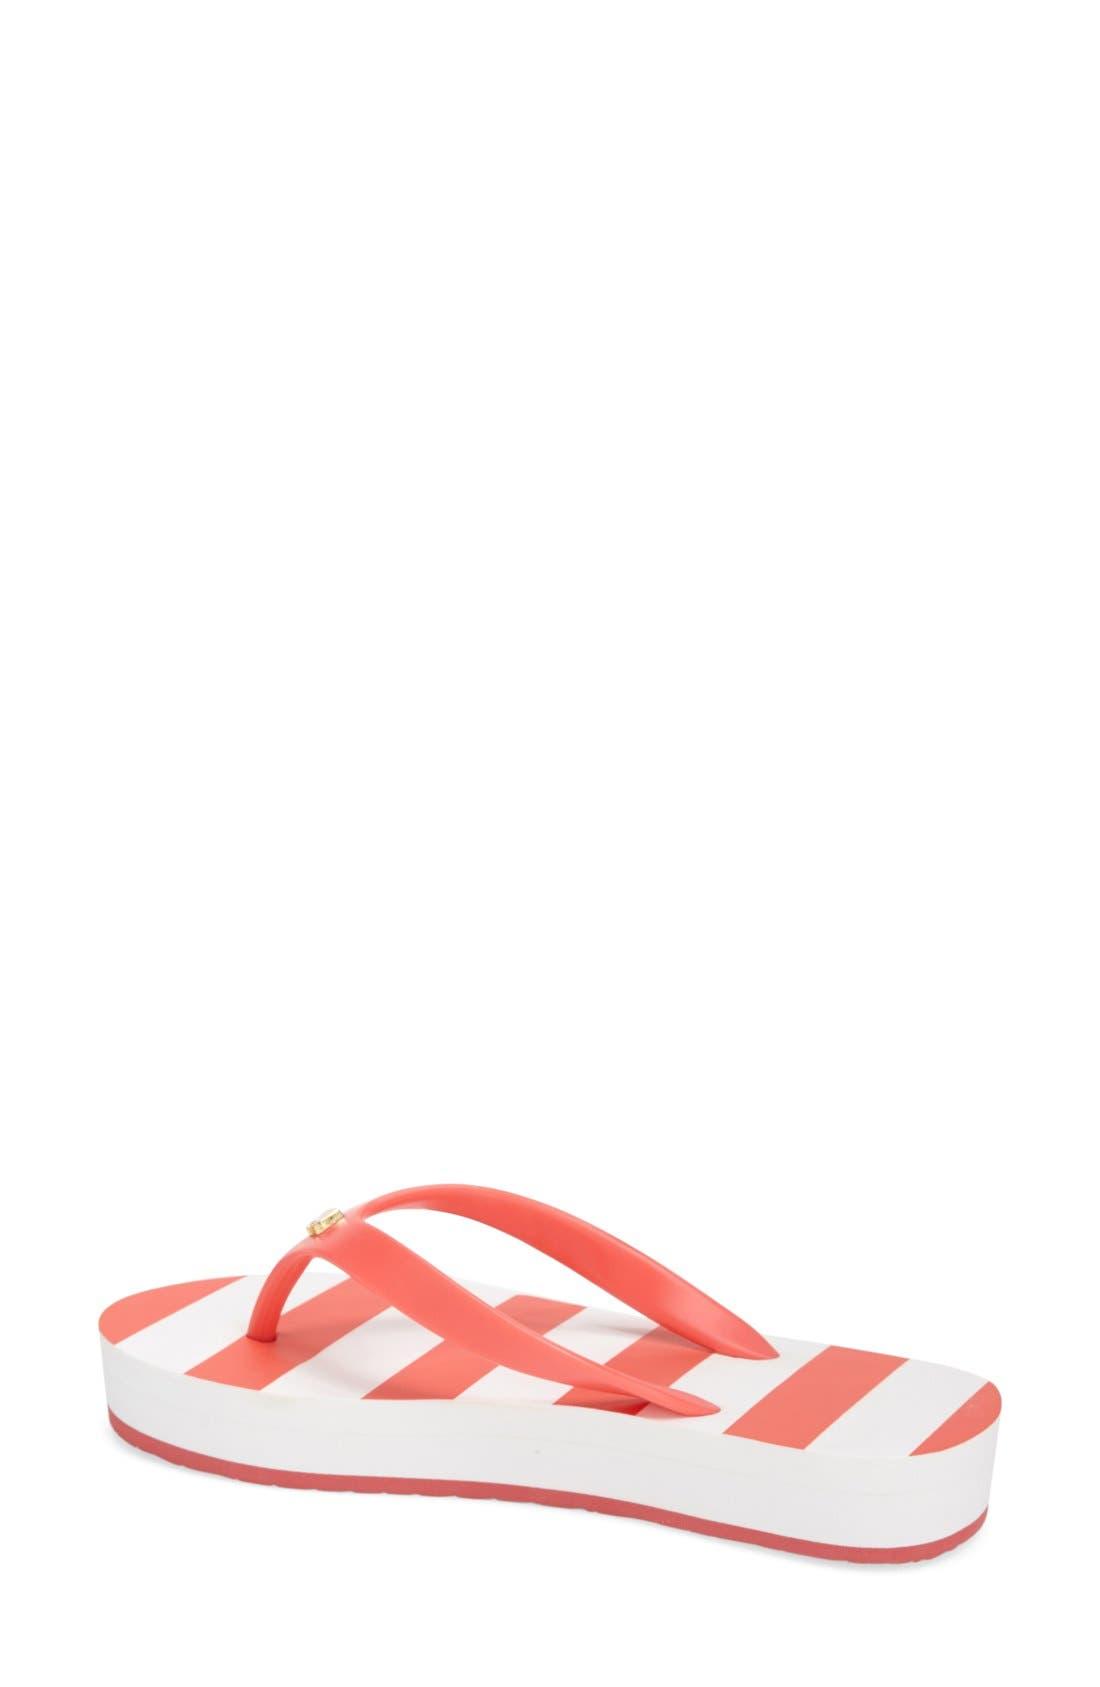 Alternate Image 2  - kate spade new york 'fanlow' flip flop (Women)